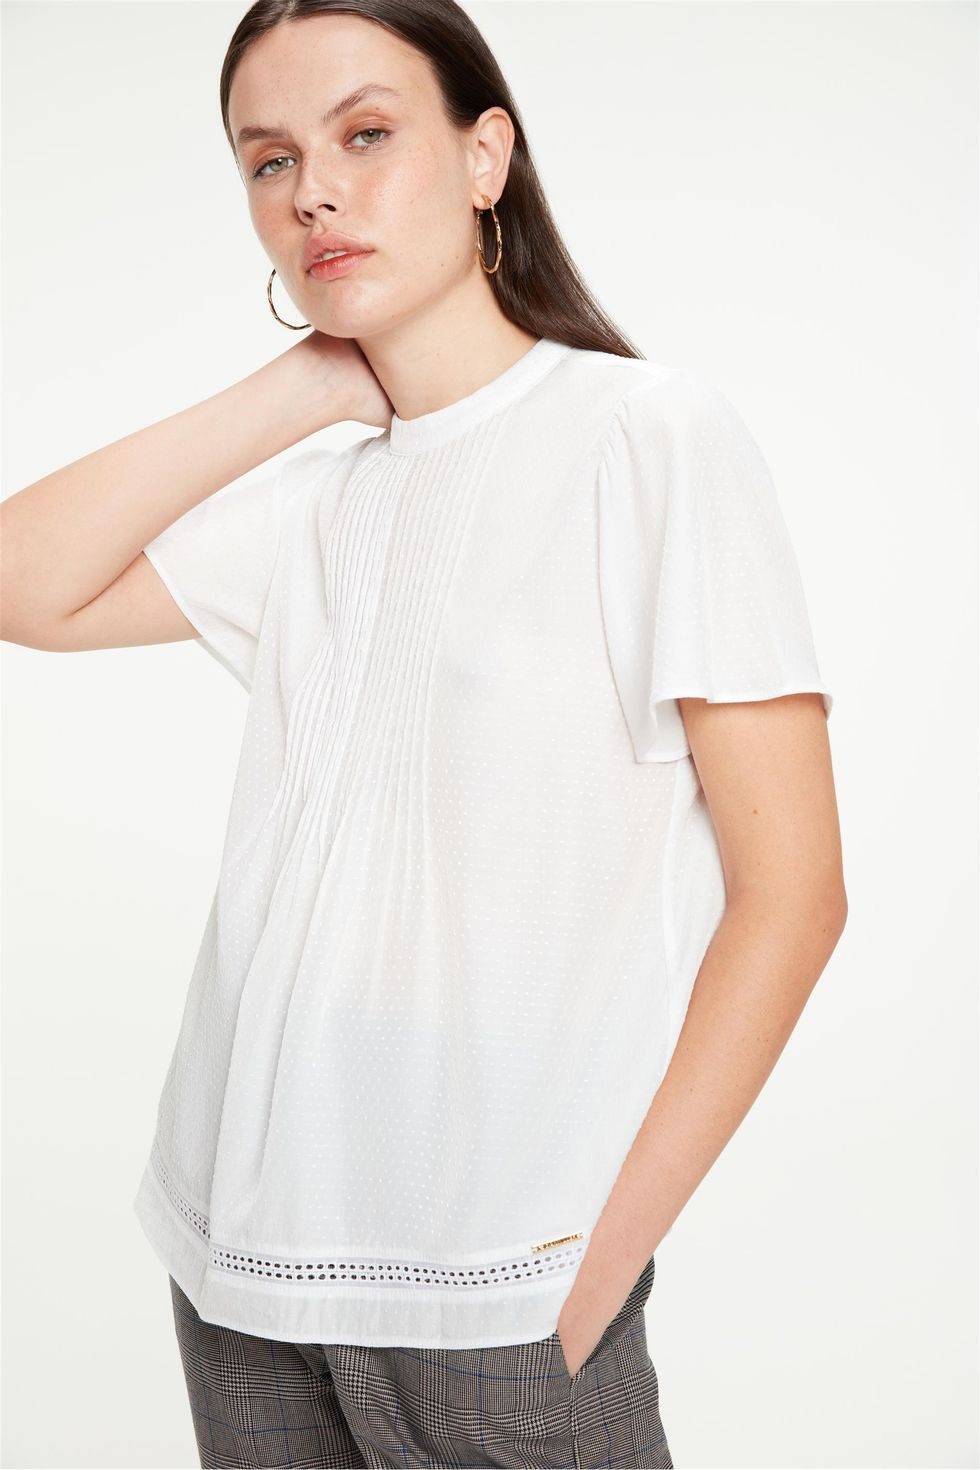 Blusa-Solta-com-Nervuras-Textura-de-Poa-Frente--